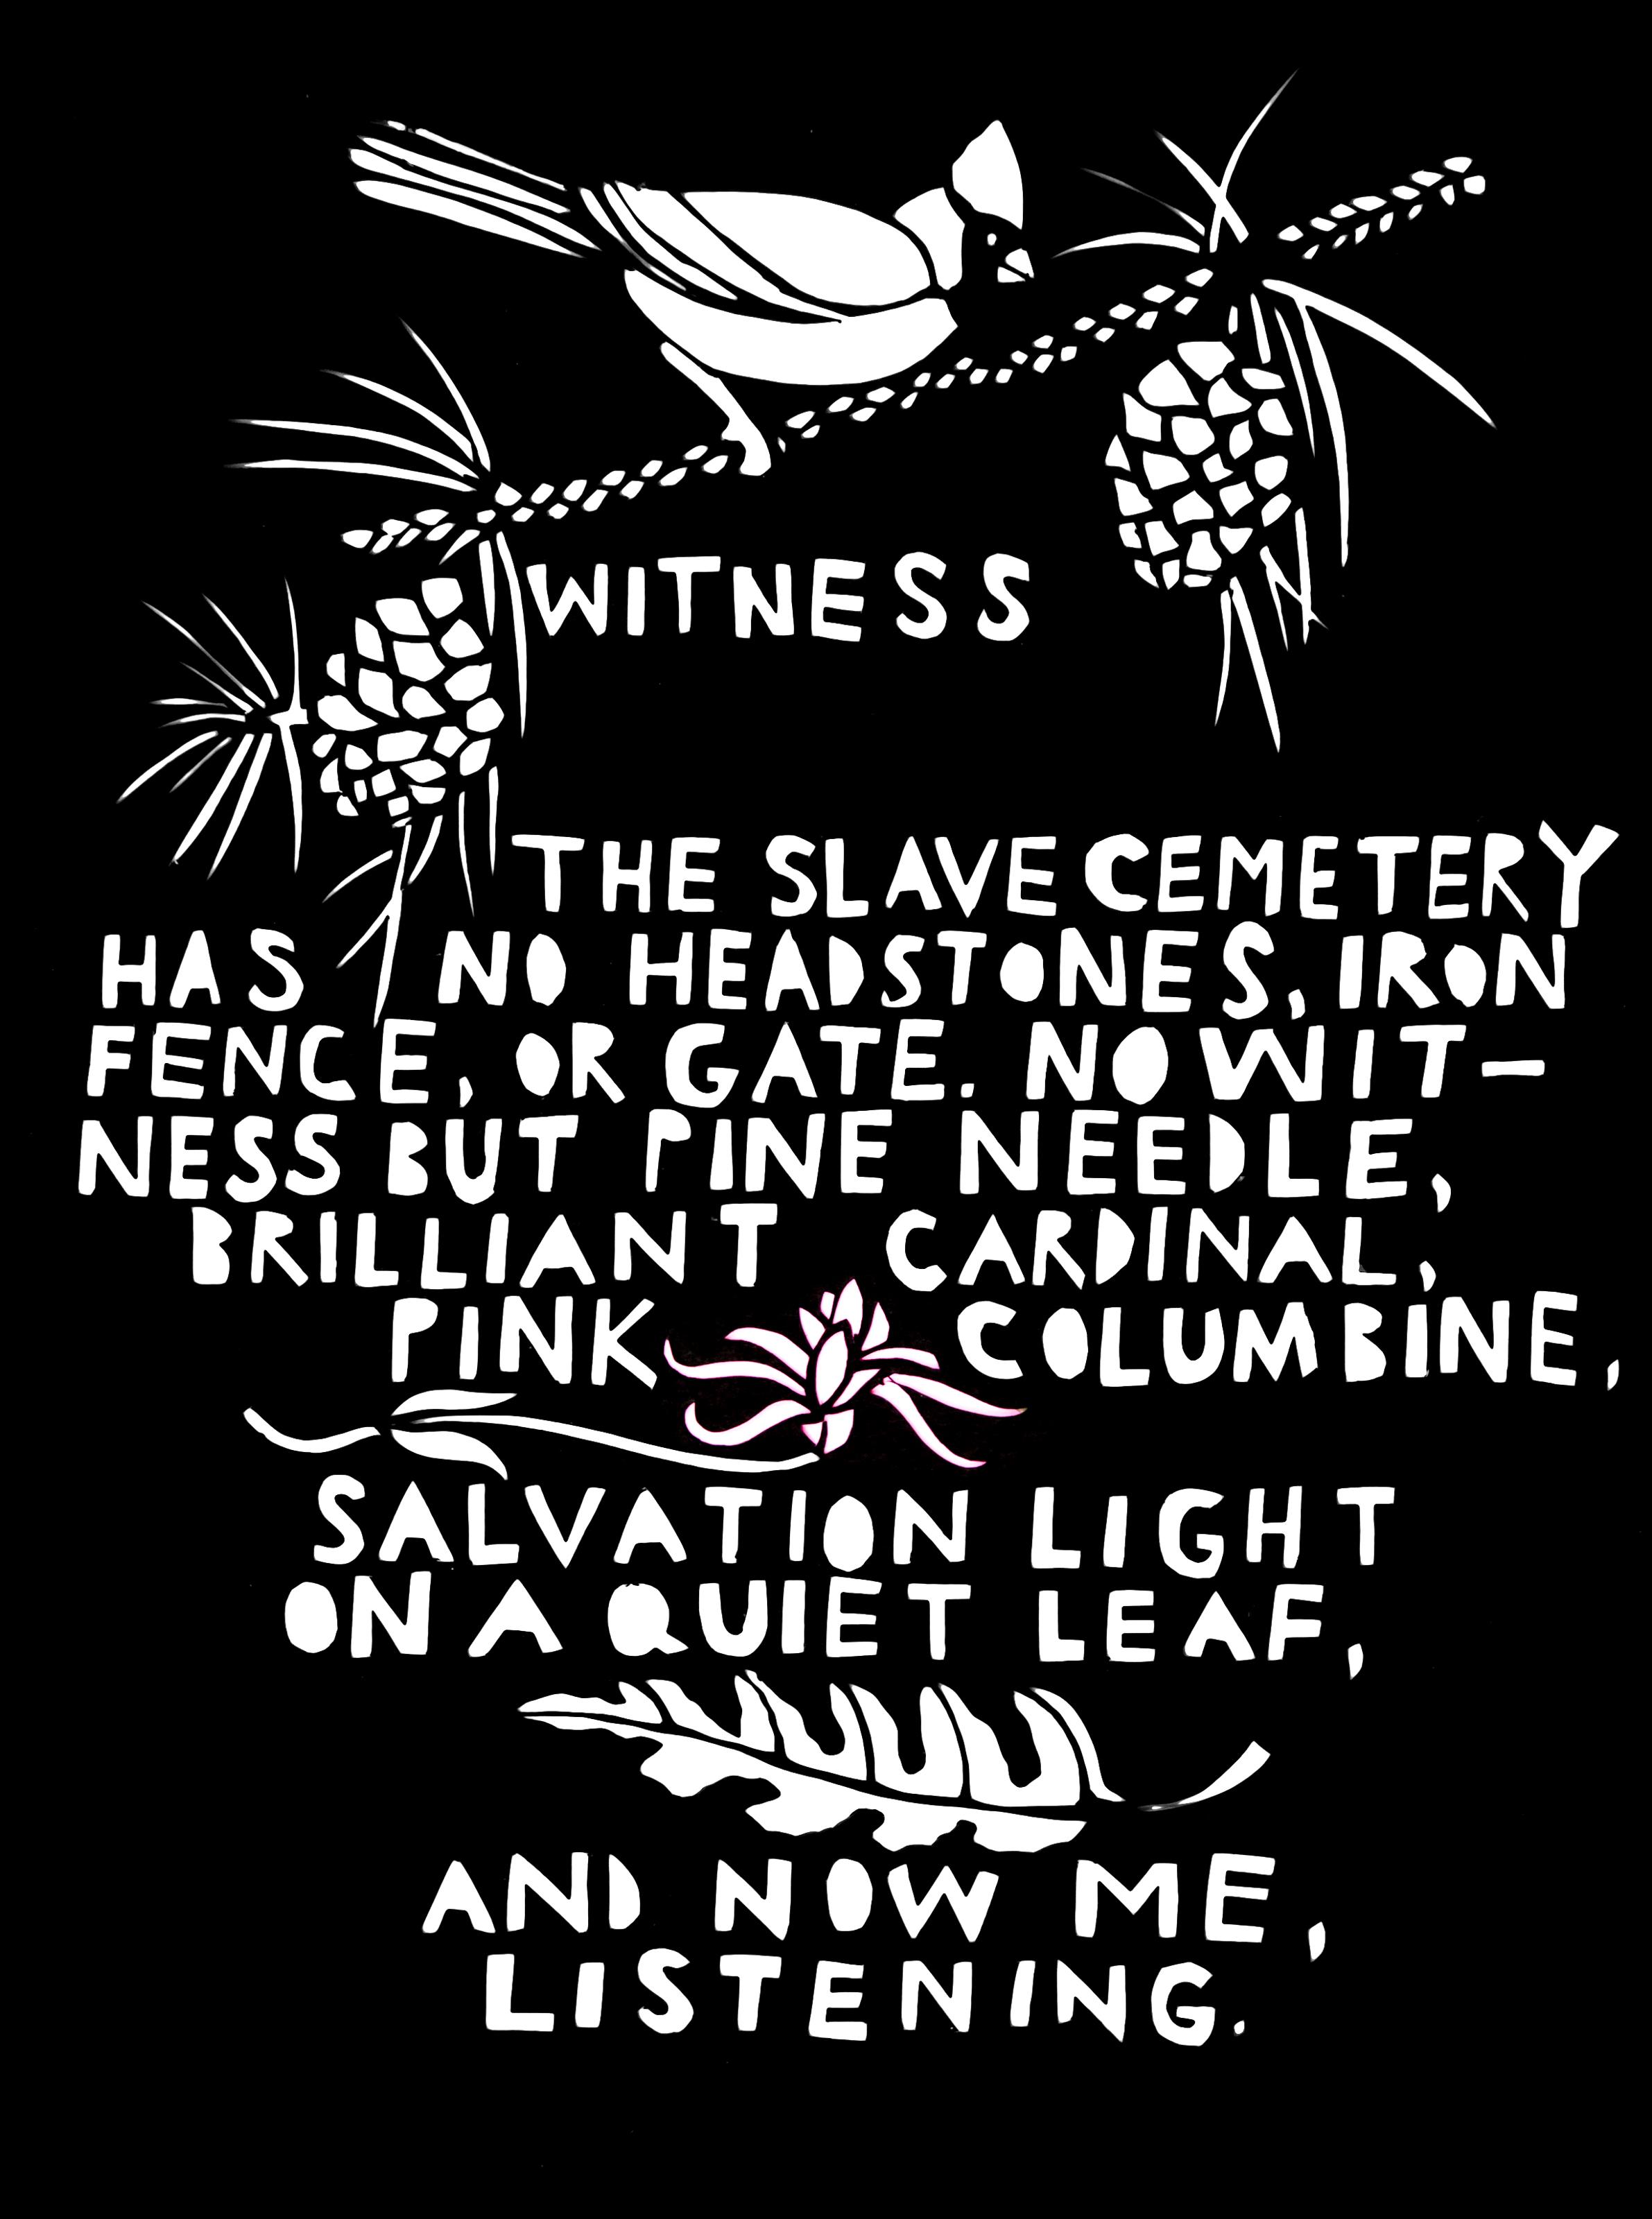 Witness - Michael Wynn